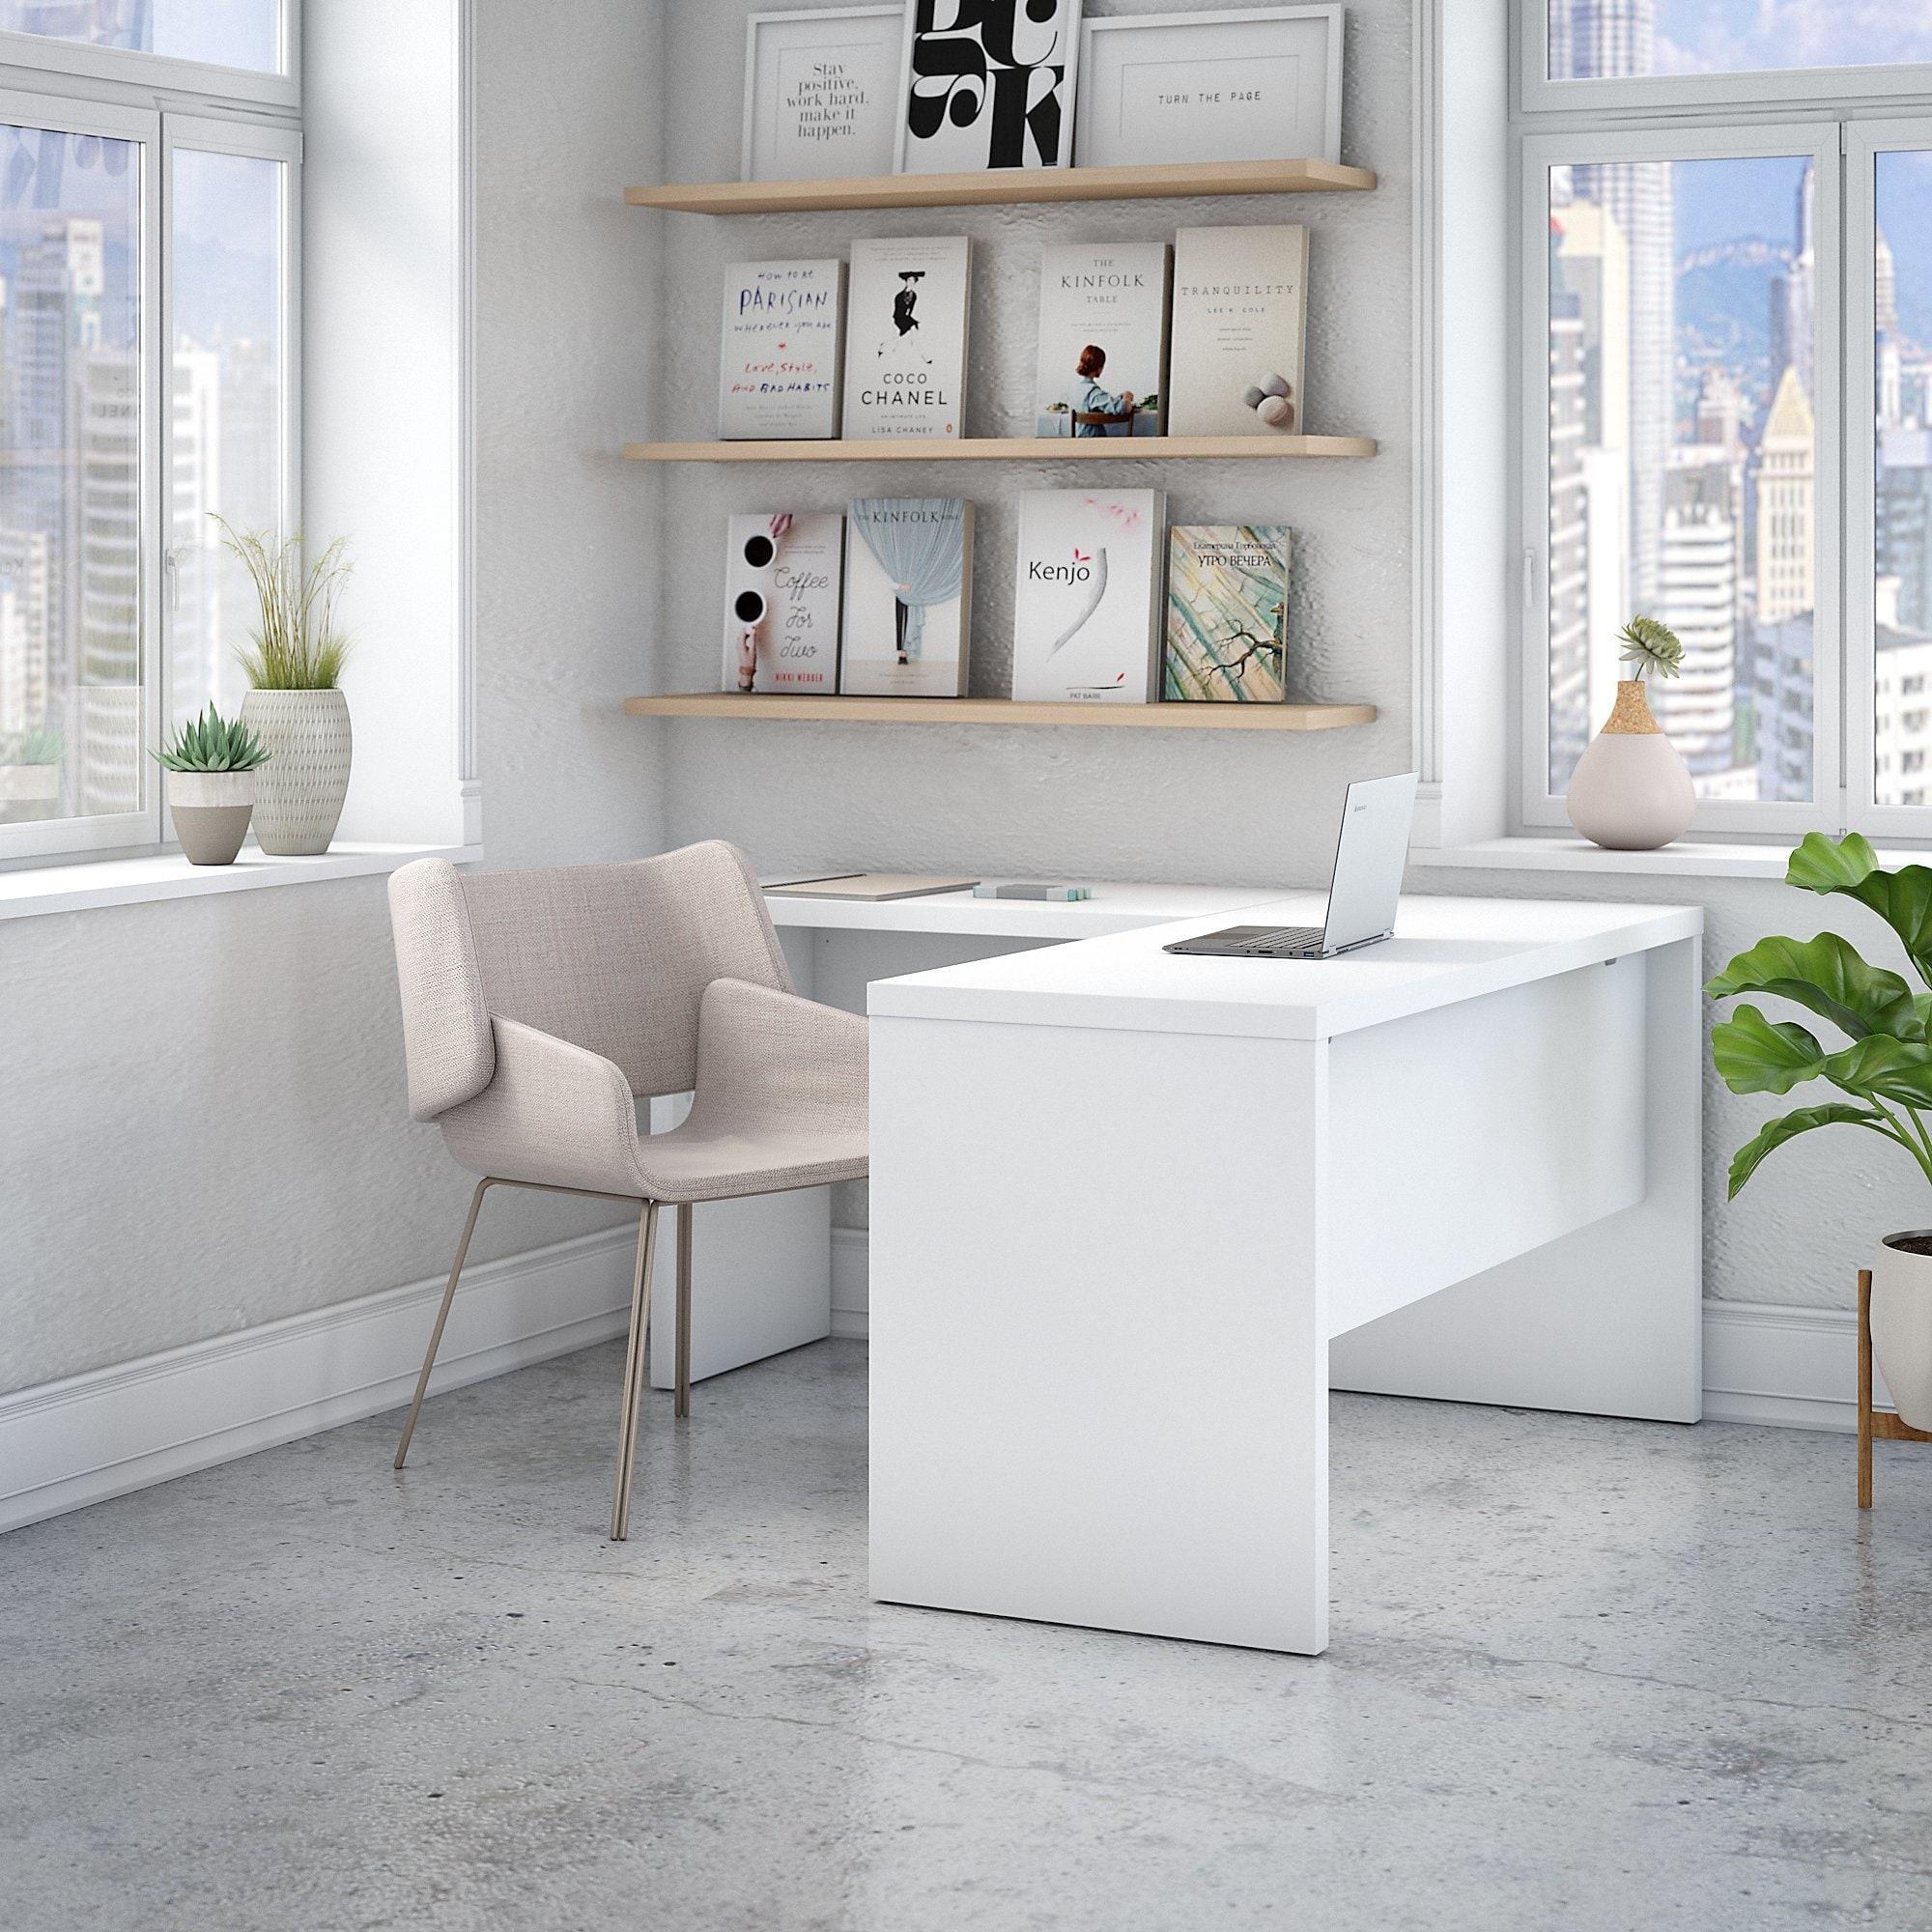 Office by kathy ireland echo l shaped desk 18 reviews sale